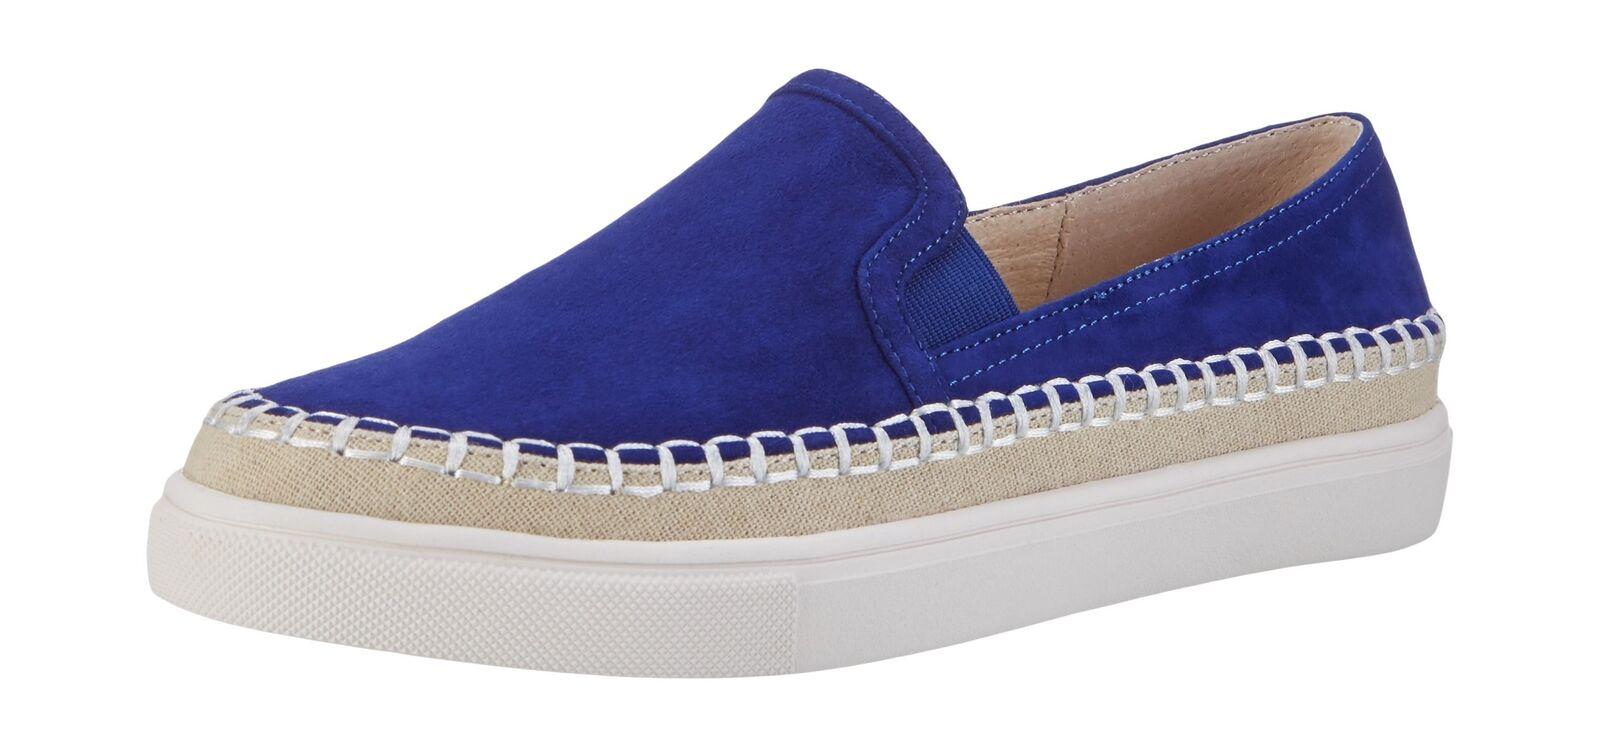 Buffalo donna 15bu0229 Kid Camoscio Mocassini Blu (blu 00) 6.5 UK | Imballaggio elegante e robusto  | Sig/Sig Ra Scarpa